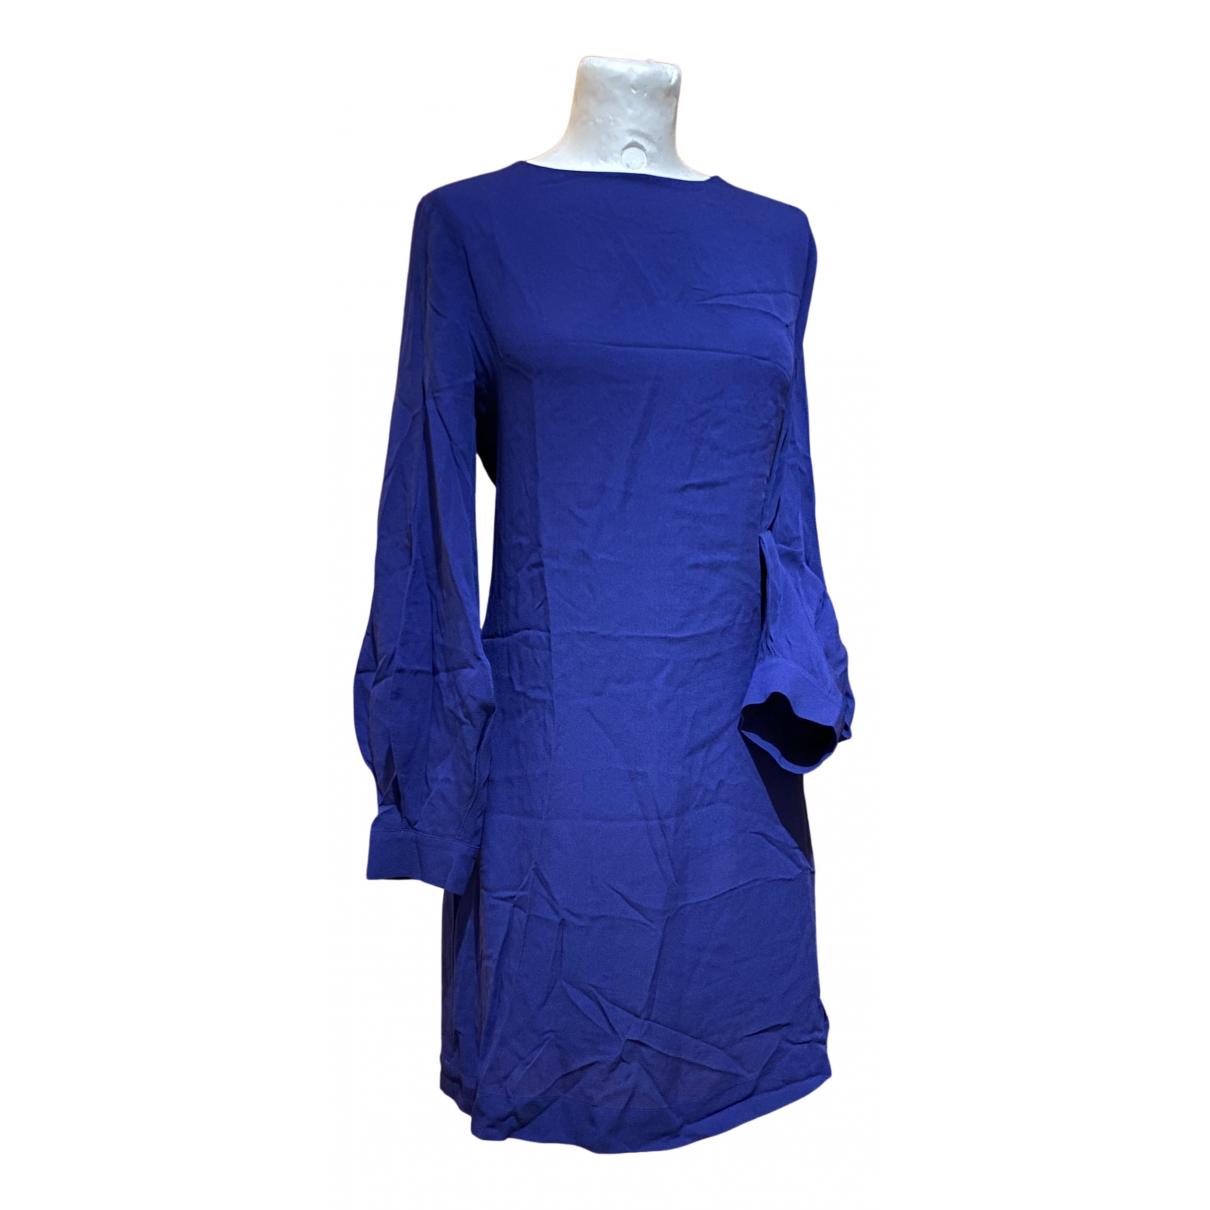 Erika Cavallini \N Kleid in  Blau Seide